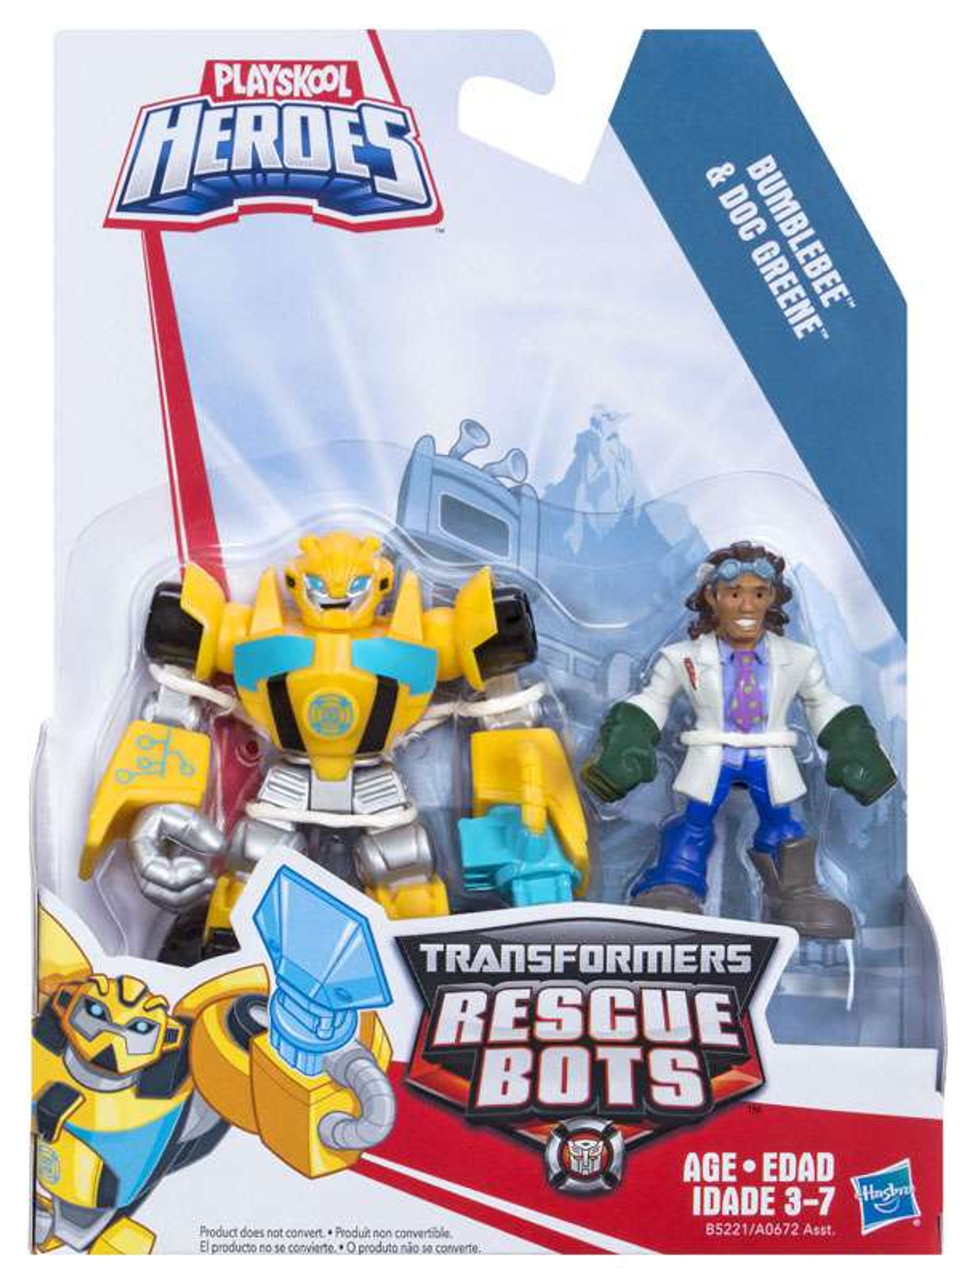 Transformers Rescue Bots Playskool Heroes Bumblebee Doc